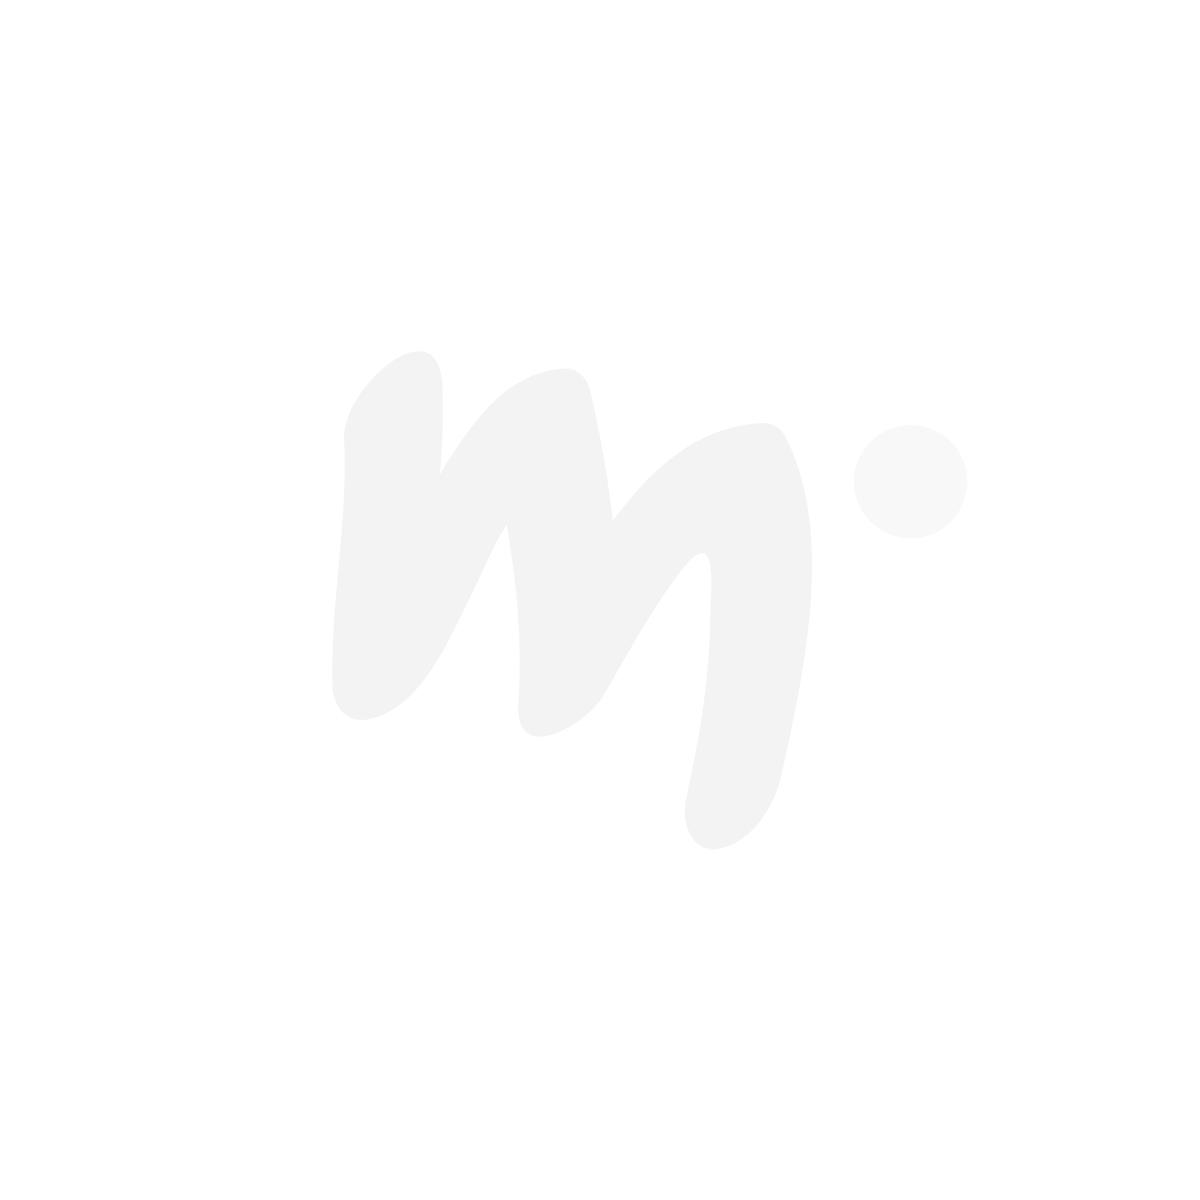 Peppi Pitkätossu Kuplat-alushousut 2 kpl